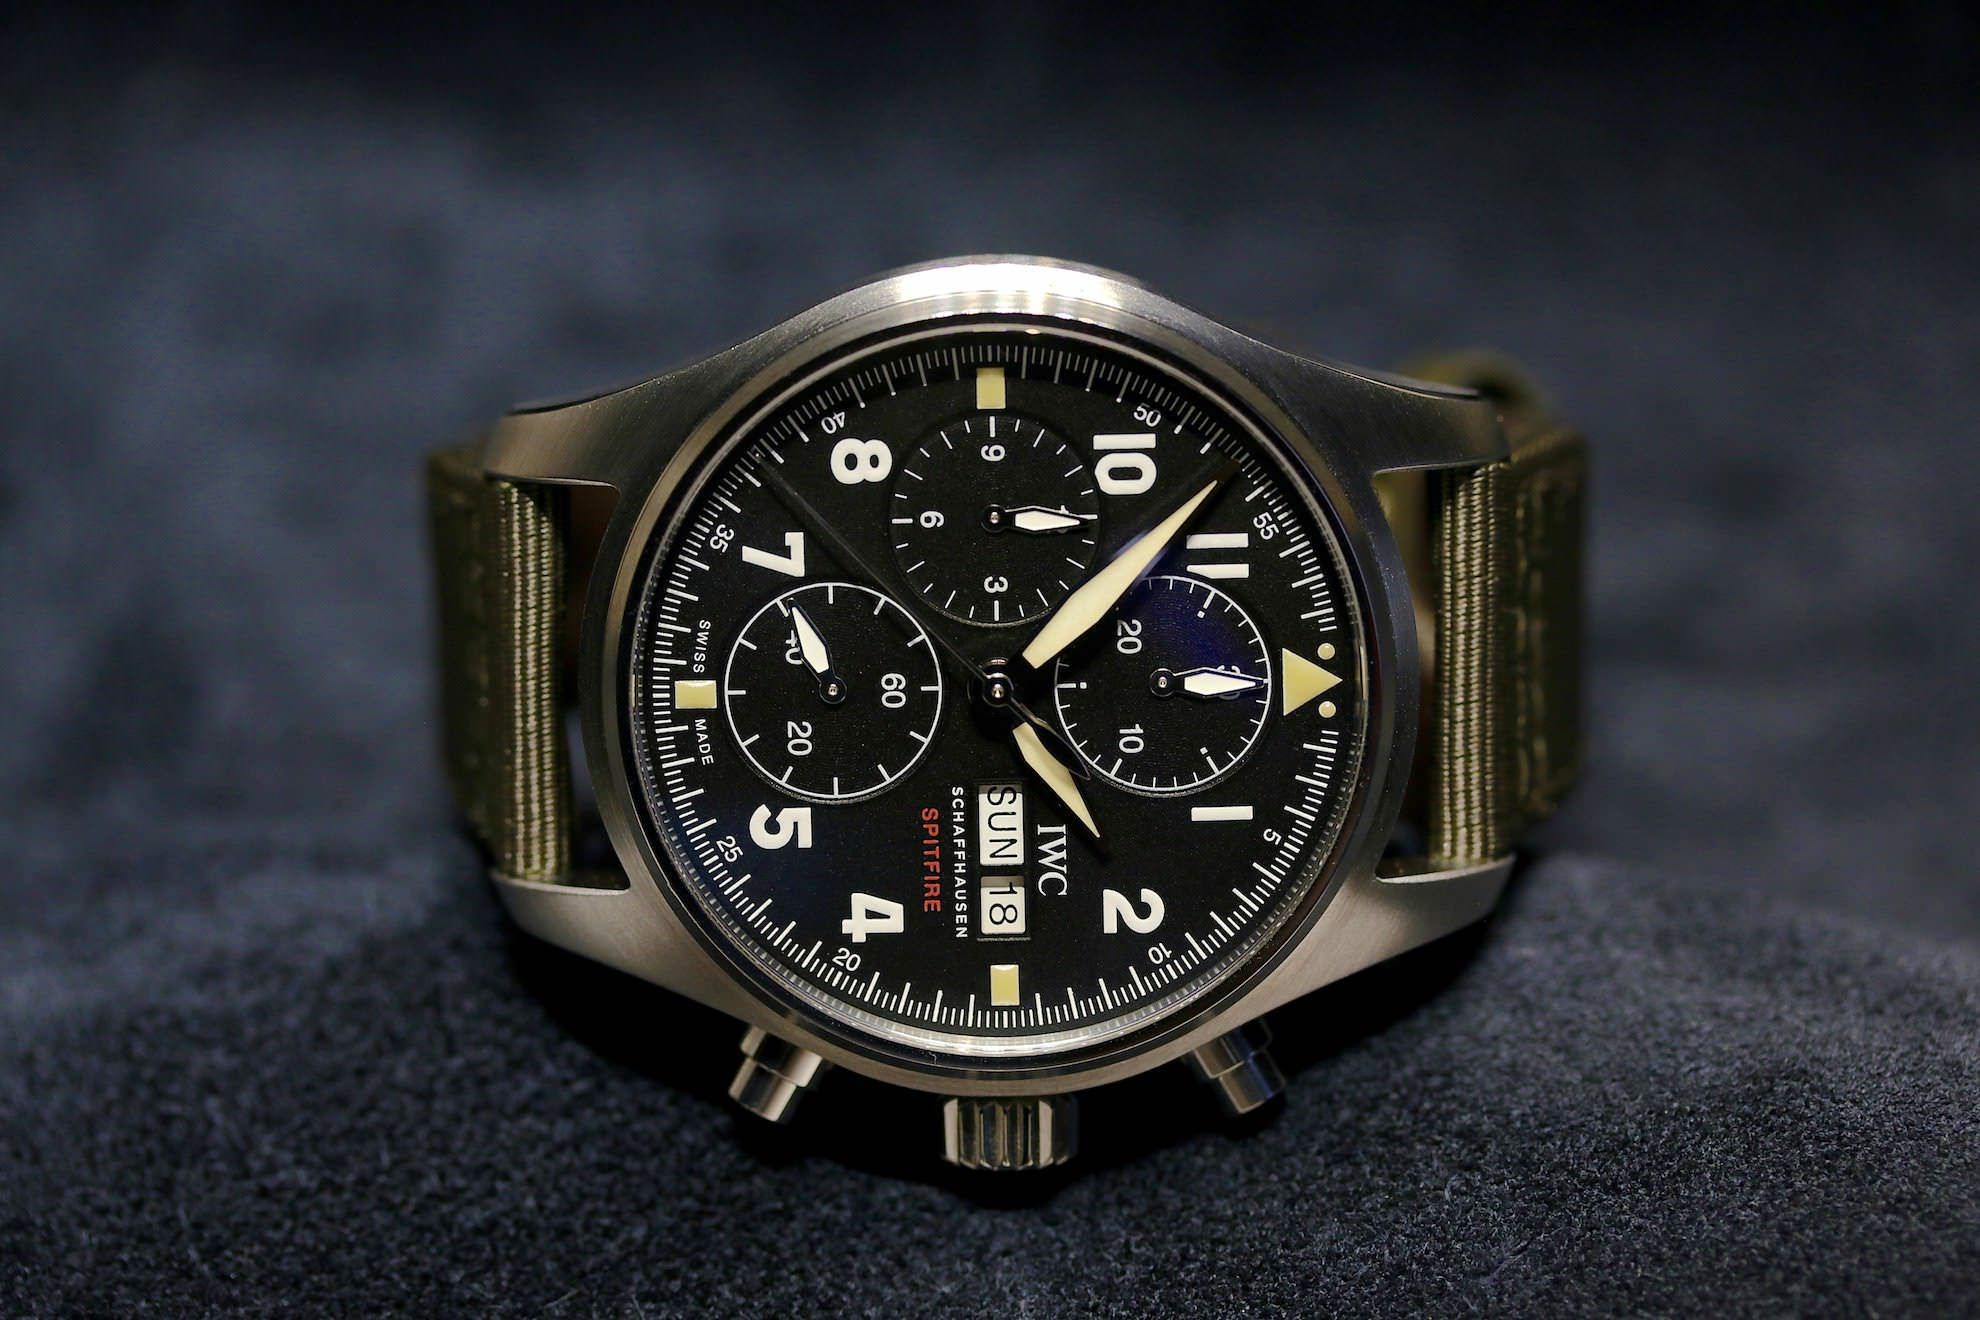 IWC_Pilots_Watch_Chronograph_Spitfire_3